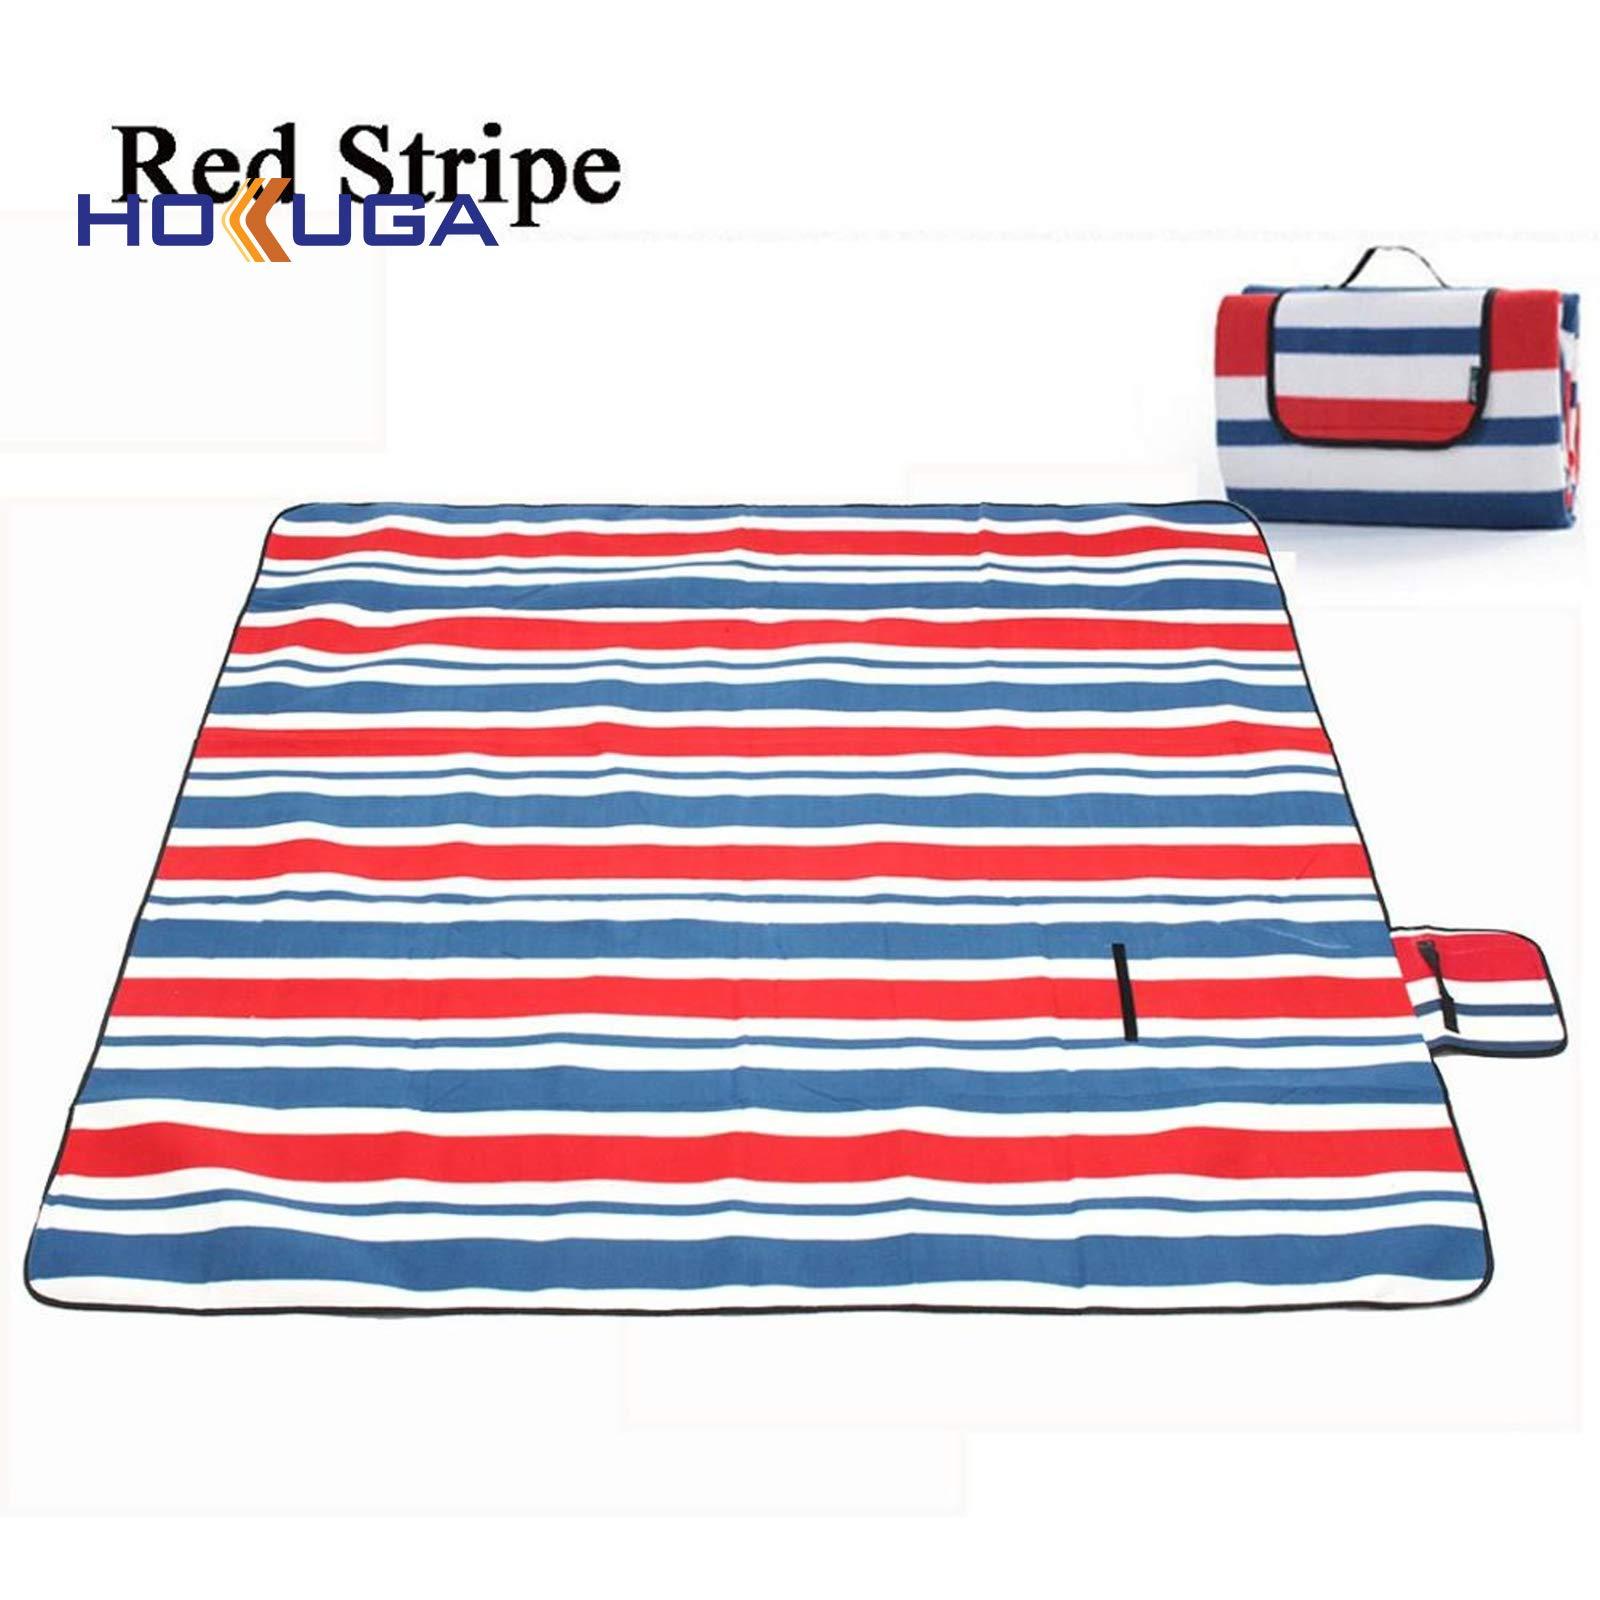 Picnic Blanket Waterproof - 200X200CM Waterproof Folding Picnic Mat Outdoor Camping Beach Moisture-Proof Blanket Portable CampingMat Hiking BeachPad (RED Stripe, Waterproof Picnic Blanket)